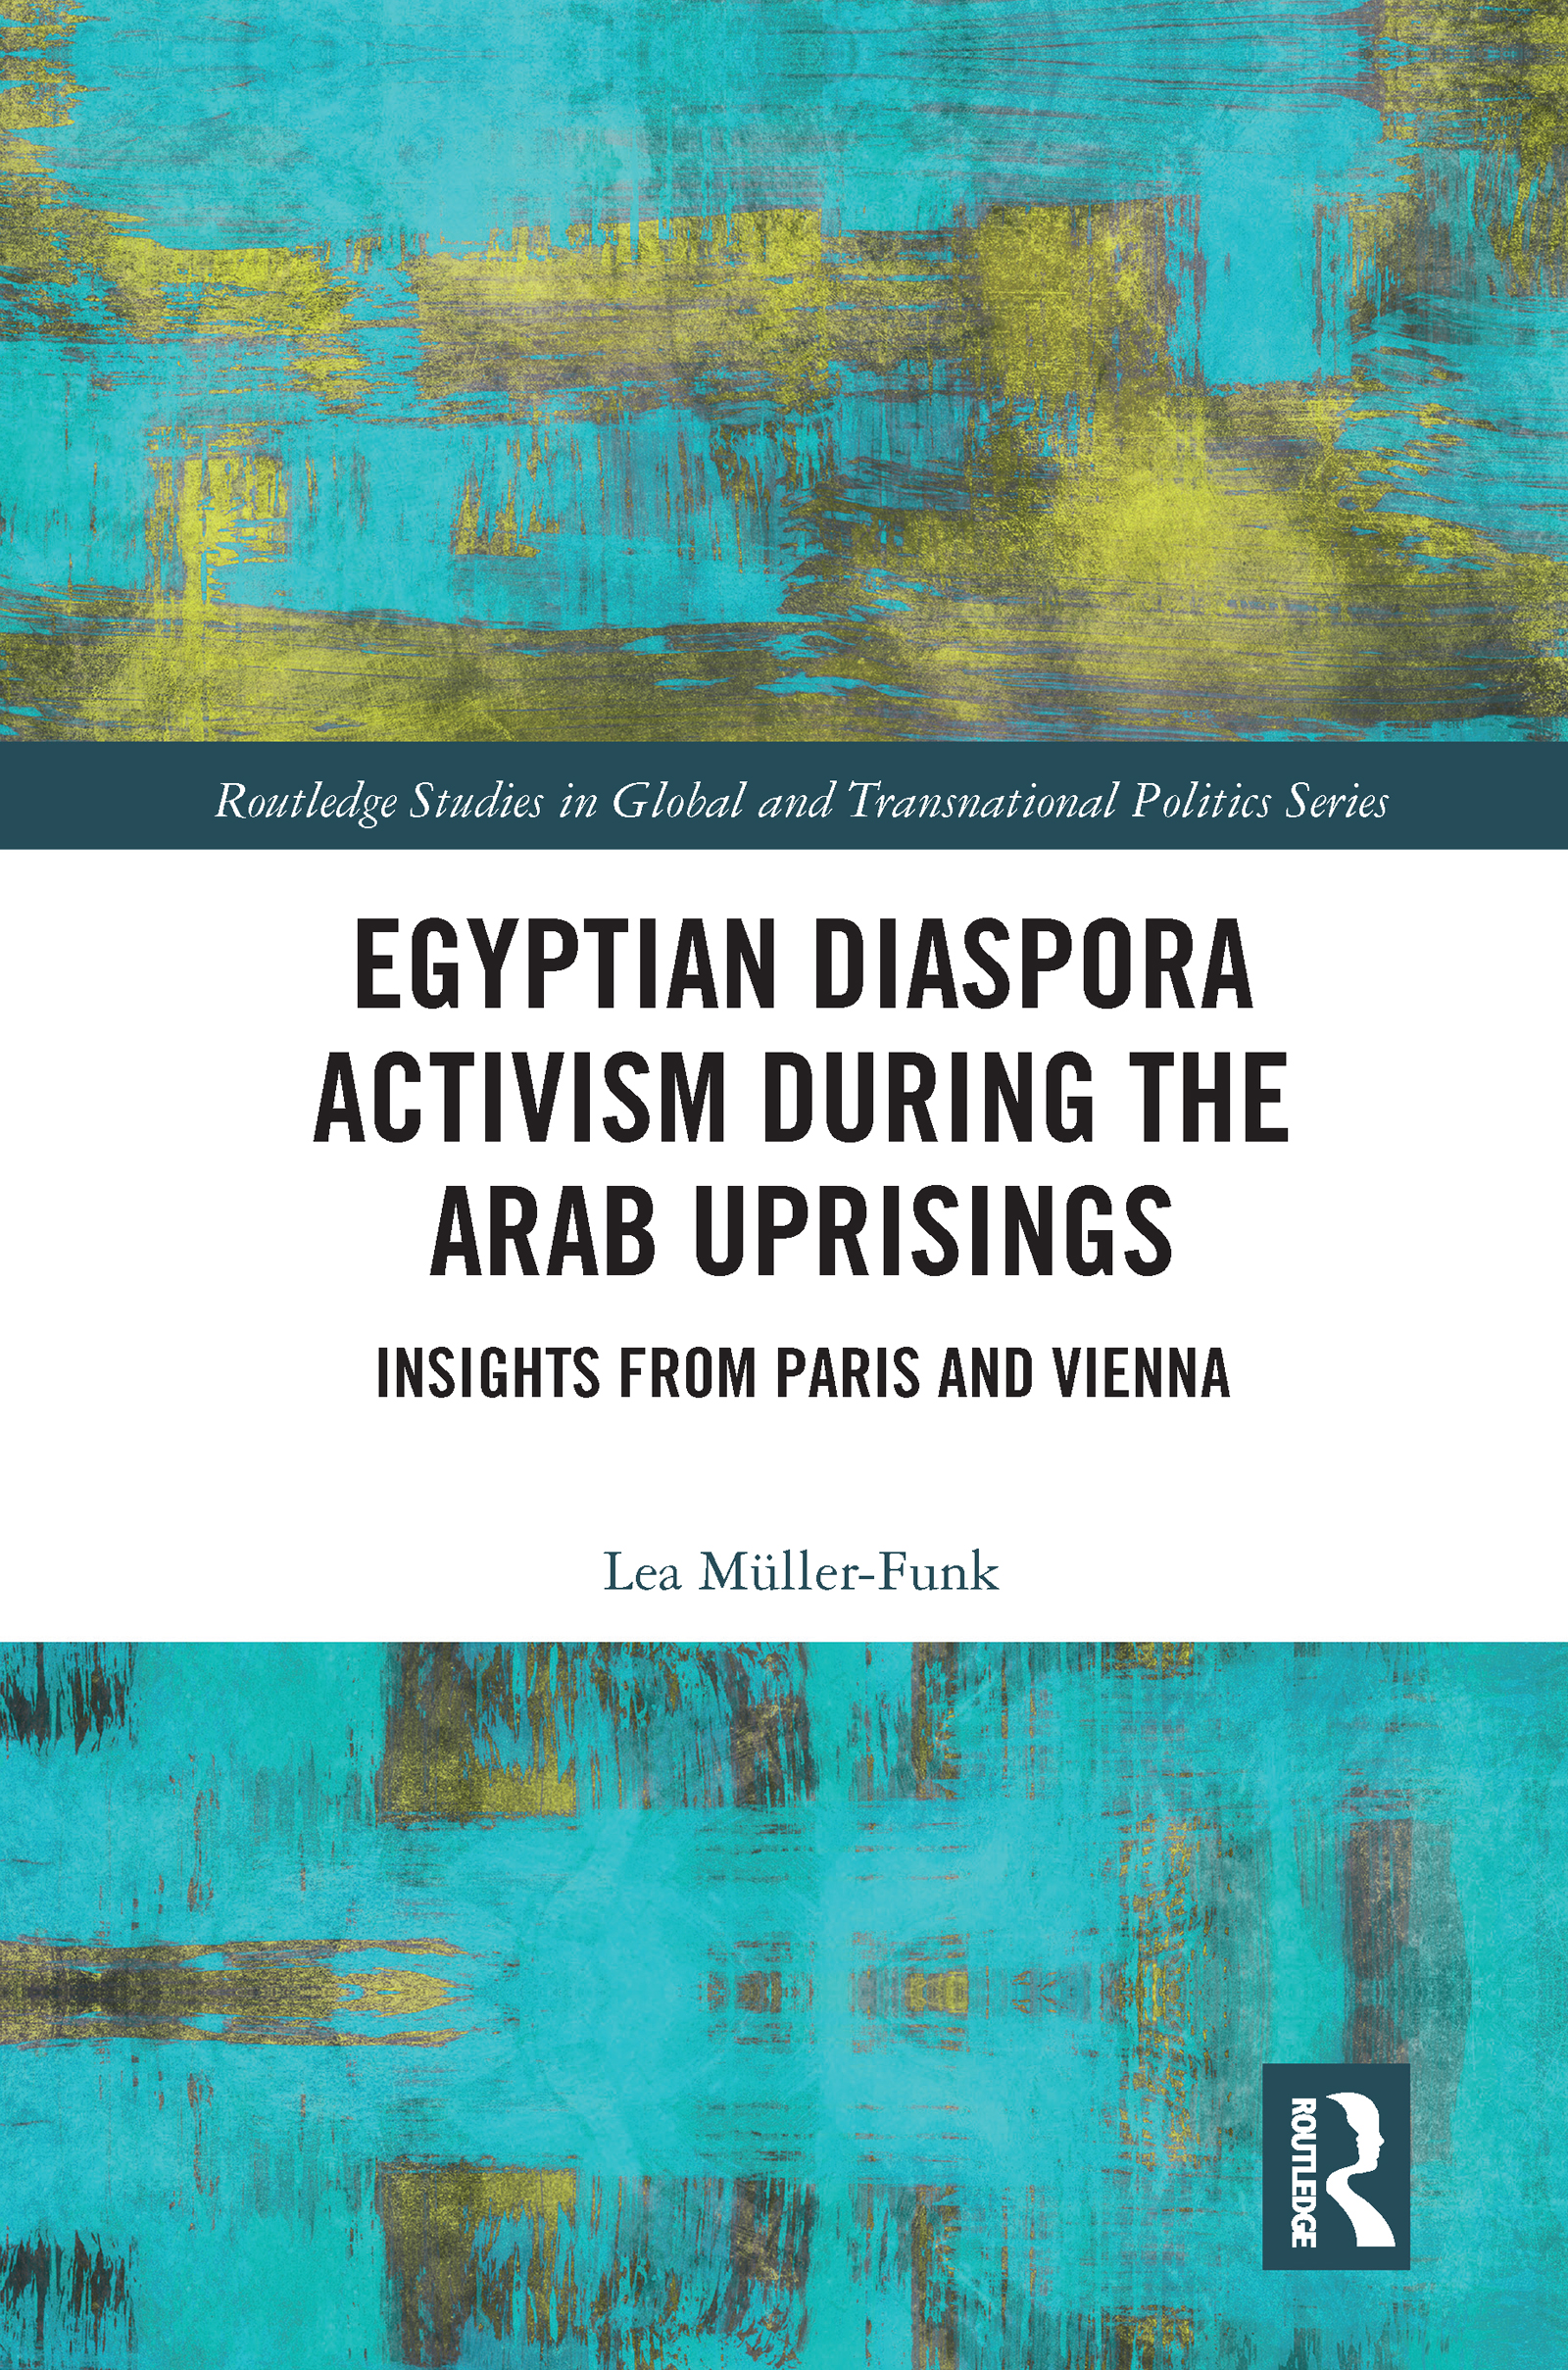 Egyptian Diaspora Activism During the Arab Uprisings